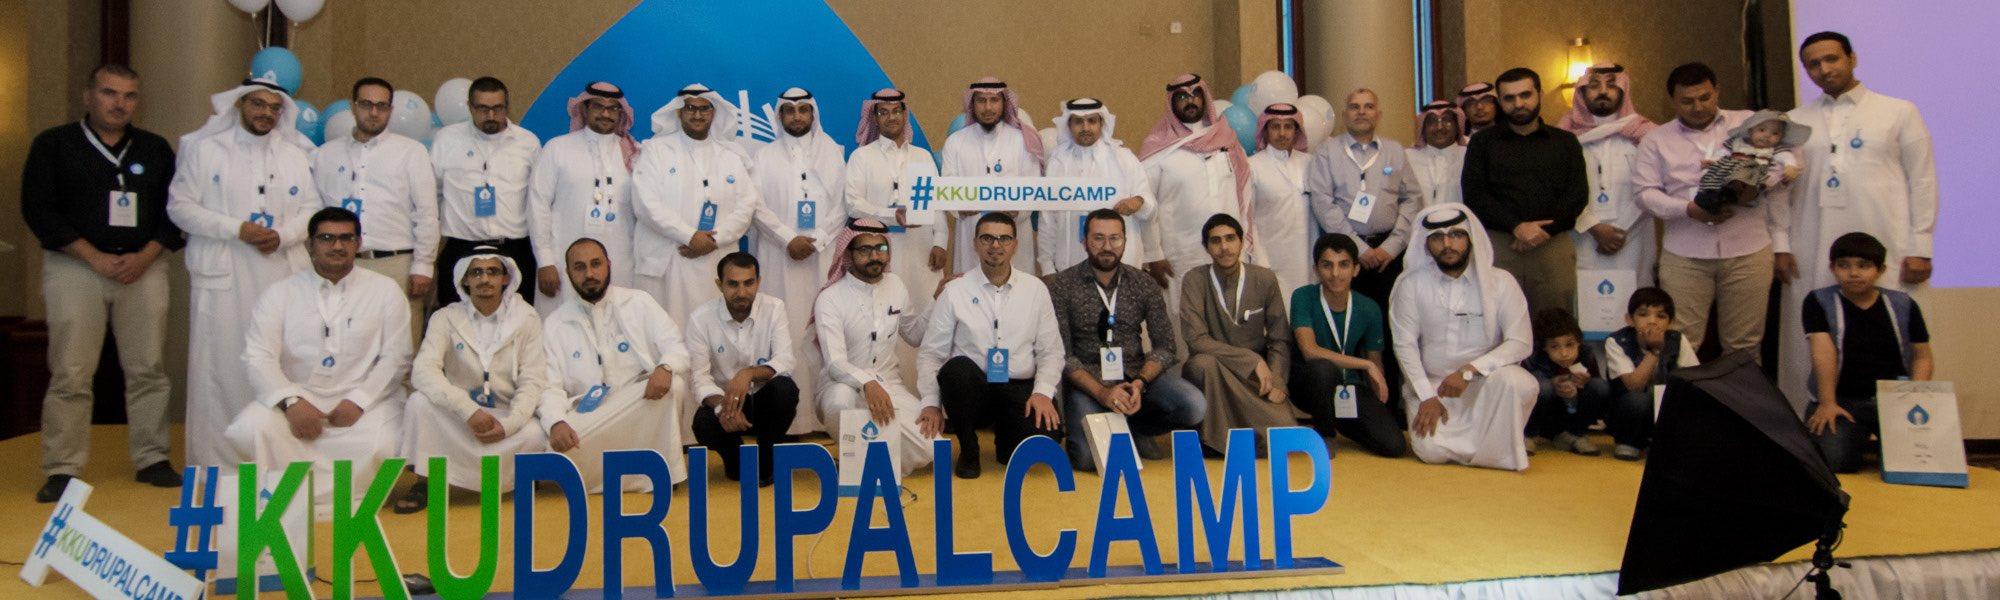 Drupal Camp KKU دروبال كامب جامعة الملك خالد